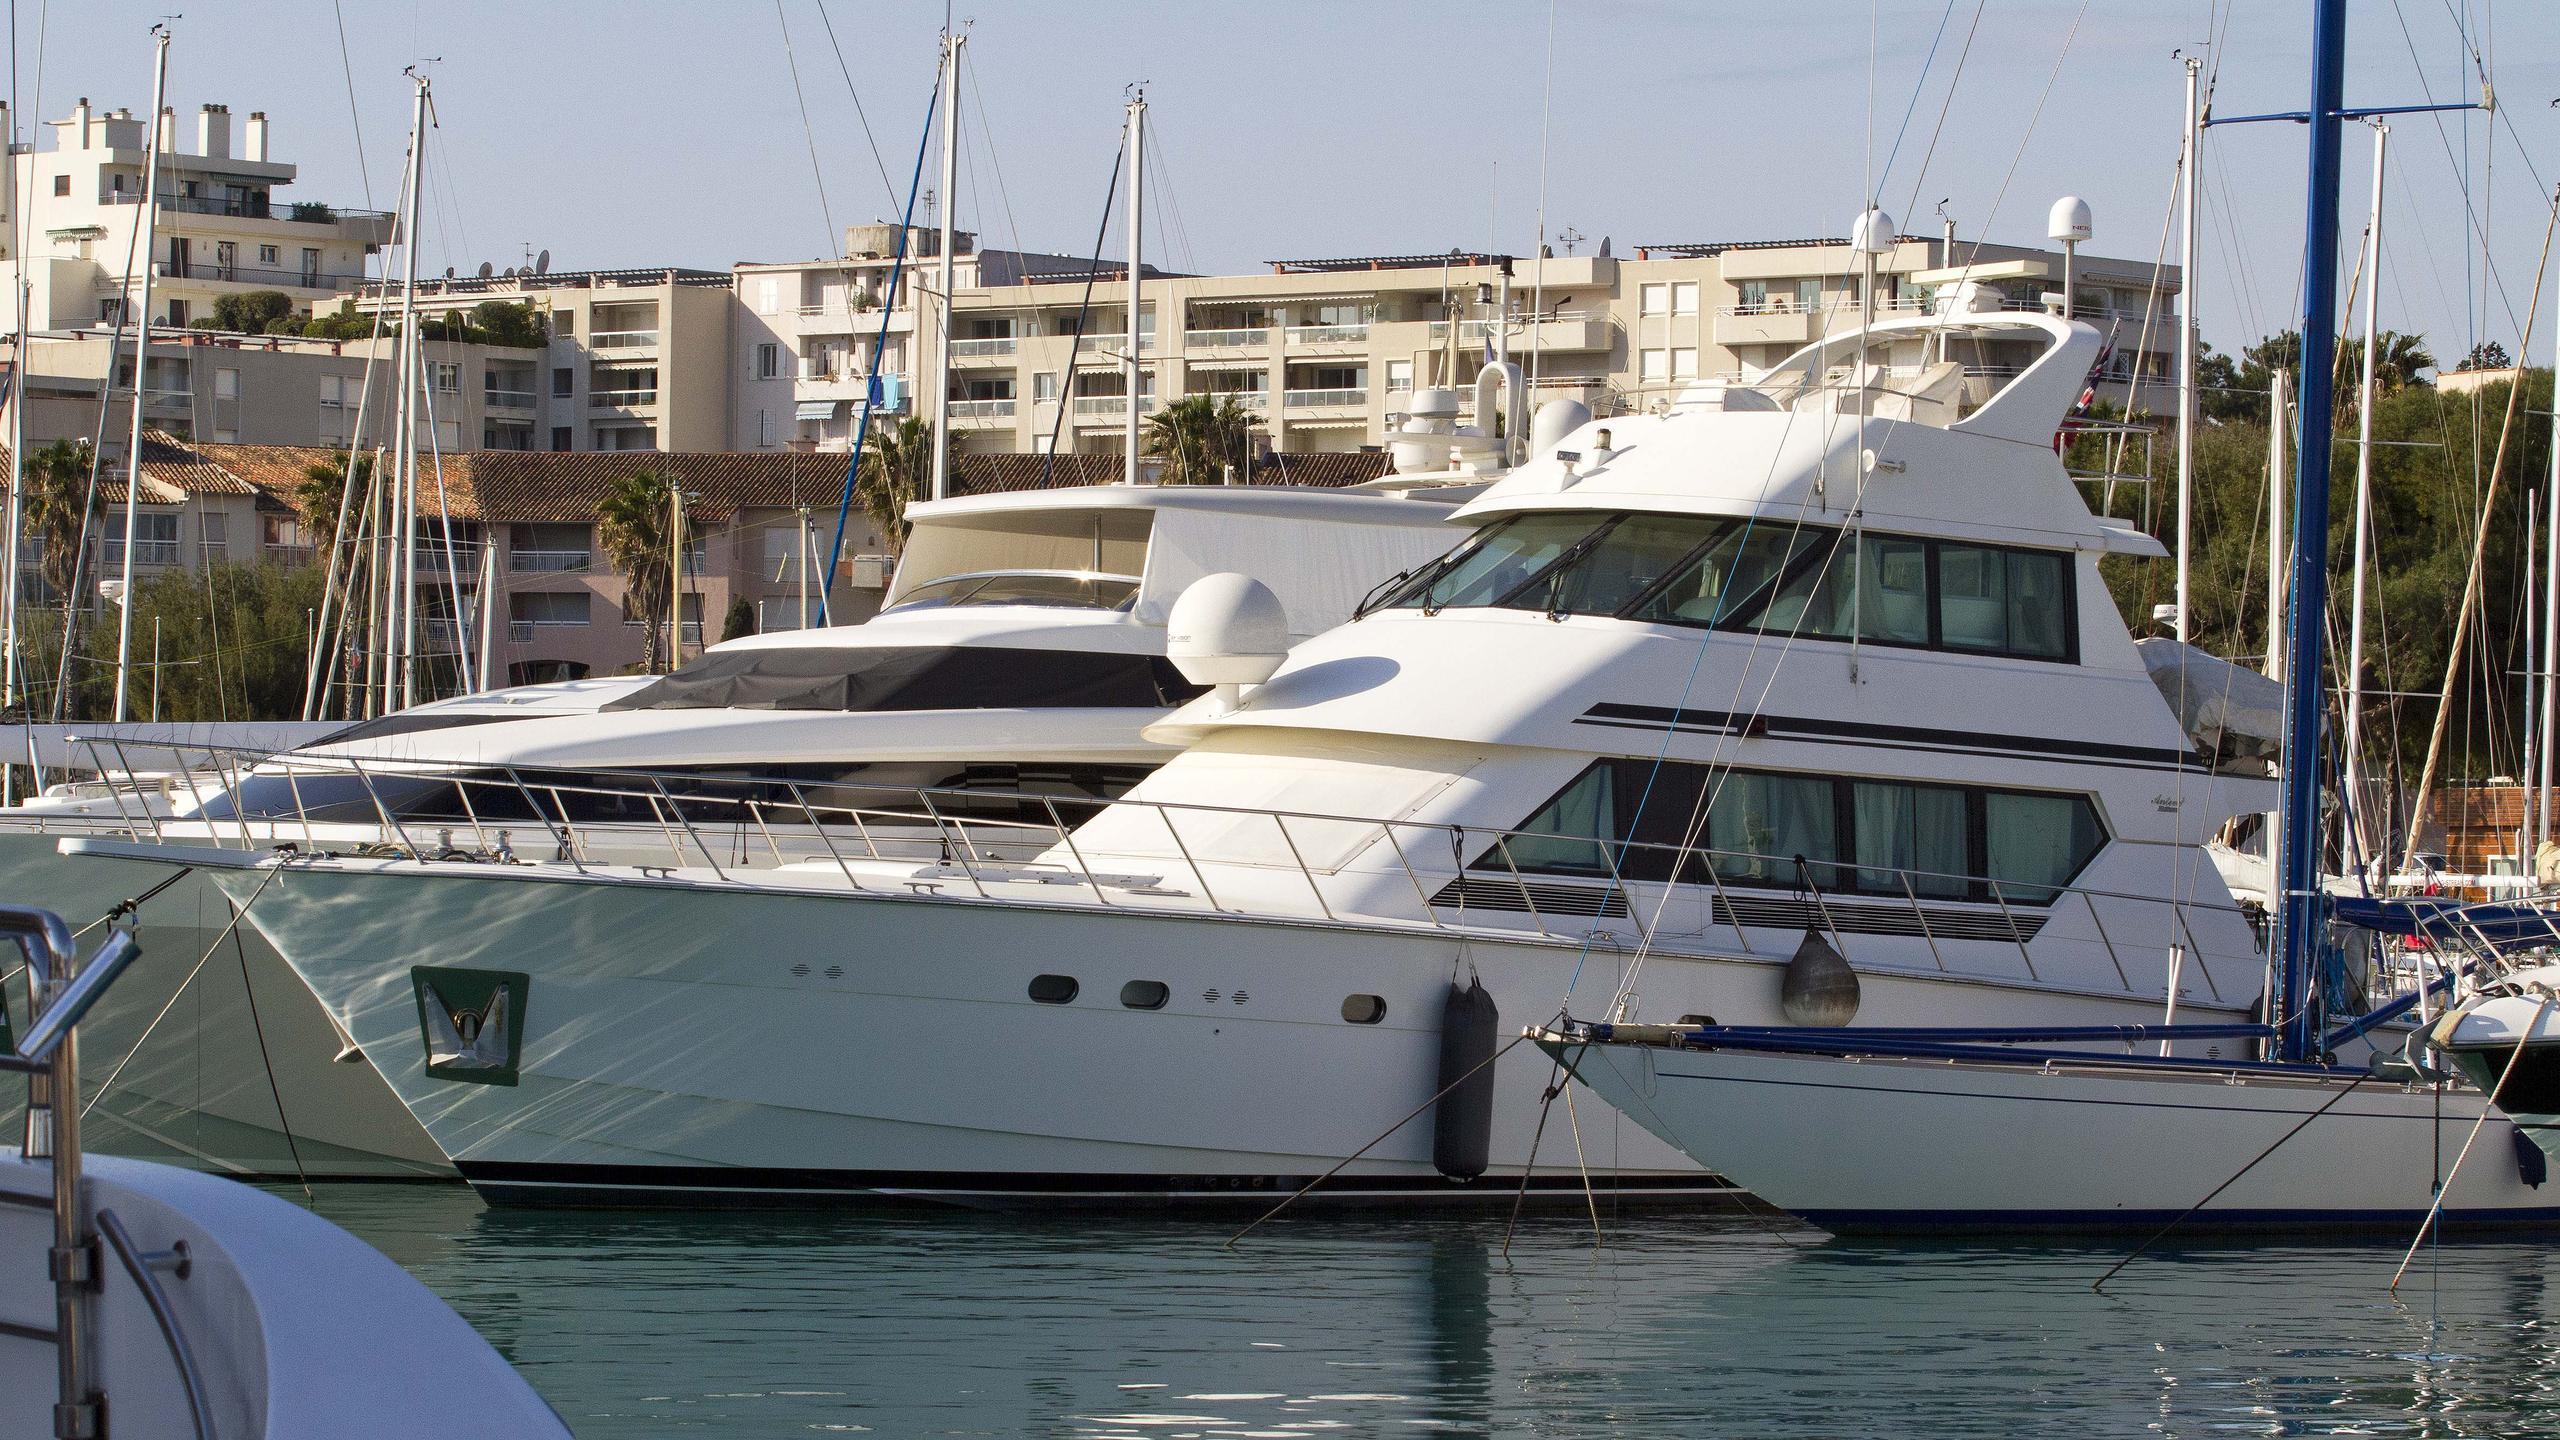 anteva-3-motor-yacht-hatteras-82-convertible-1992-25m-front-profile